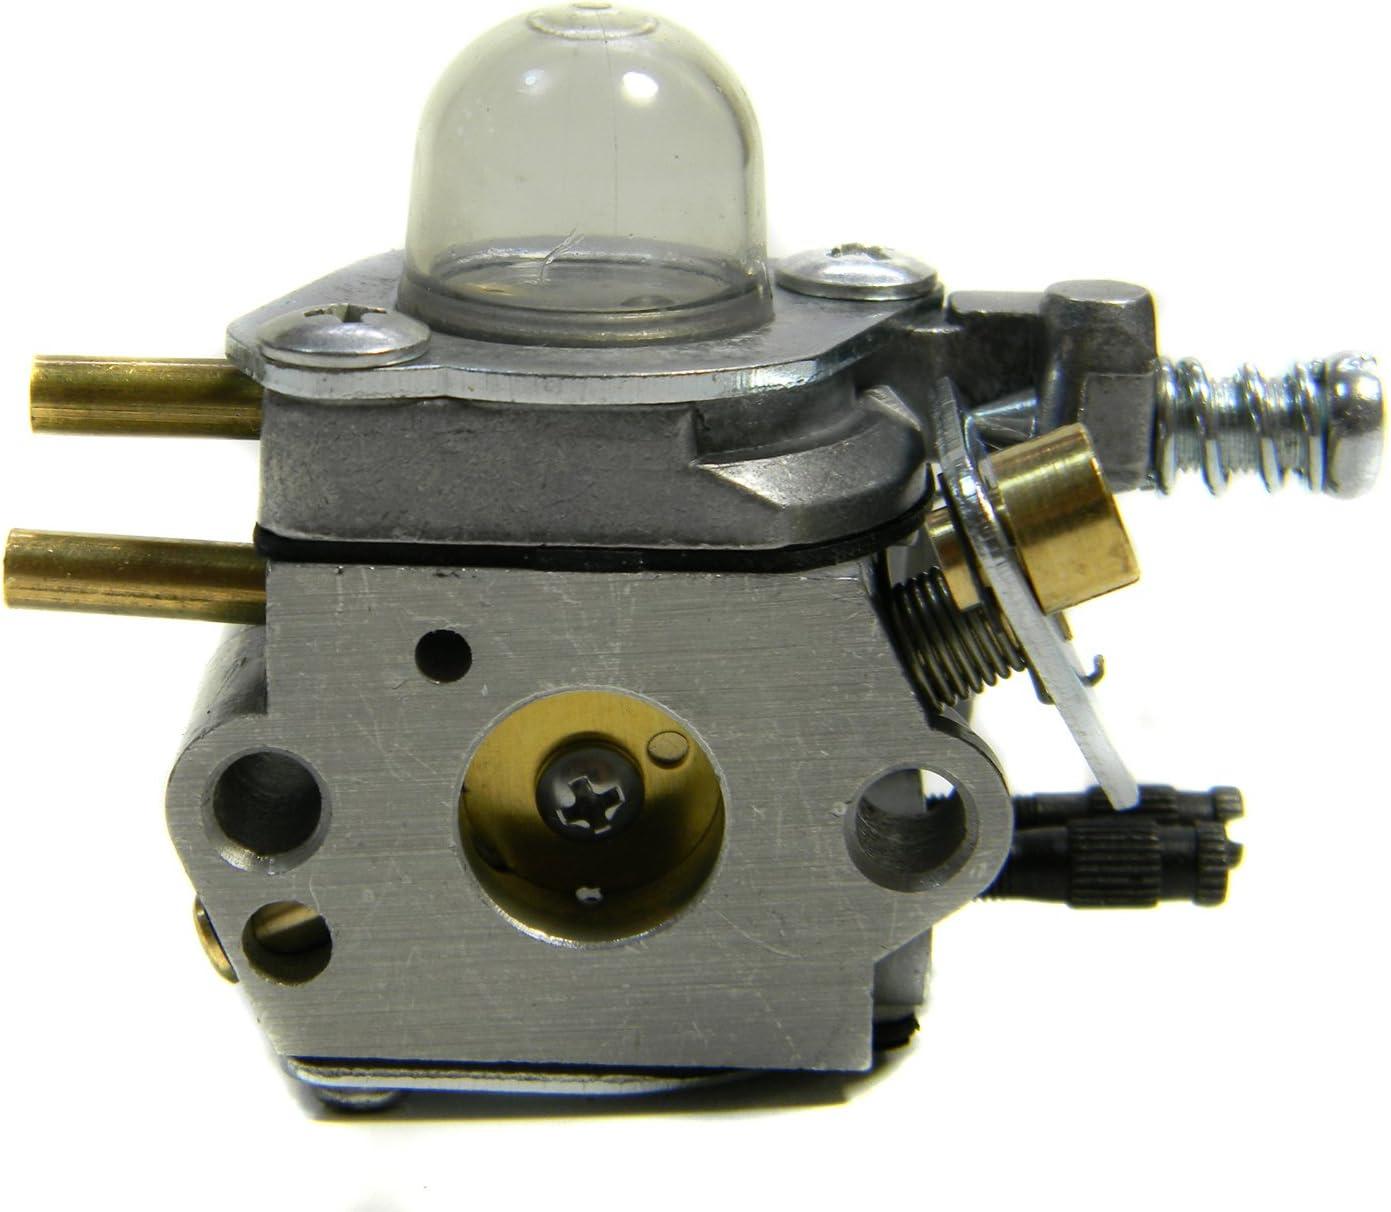 Carburetor Zama K52 used on SRM-2100 Type 1 San Diego Mall Import 159491 Mod Up N: S